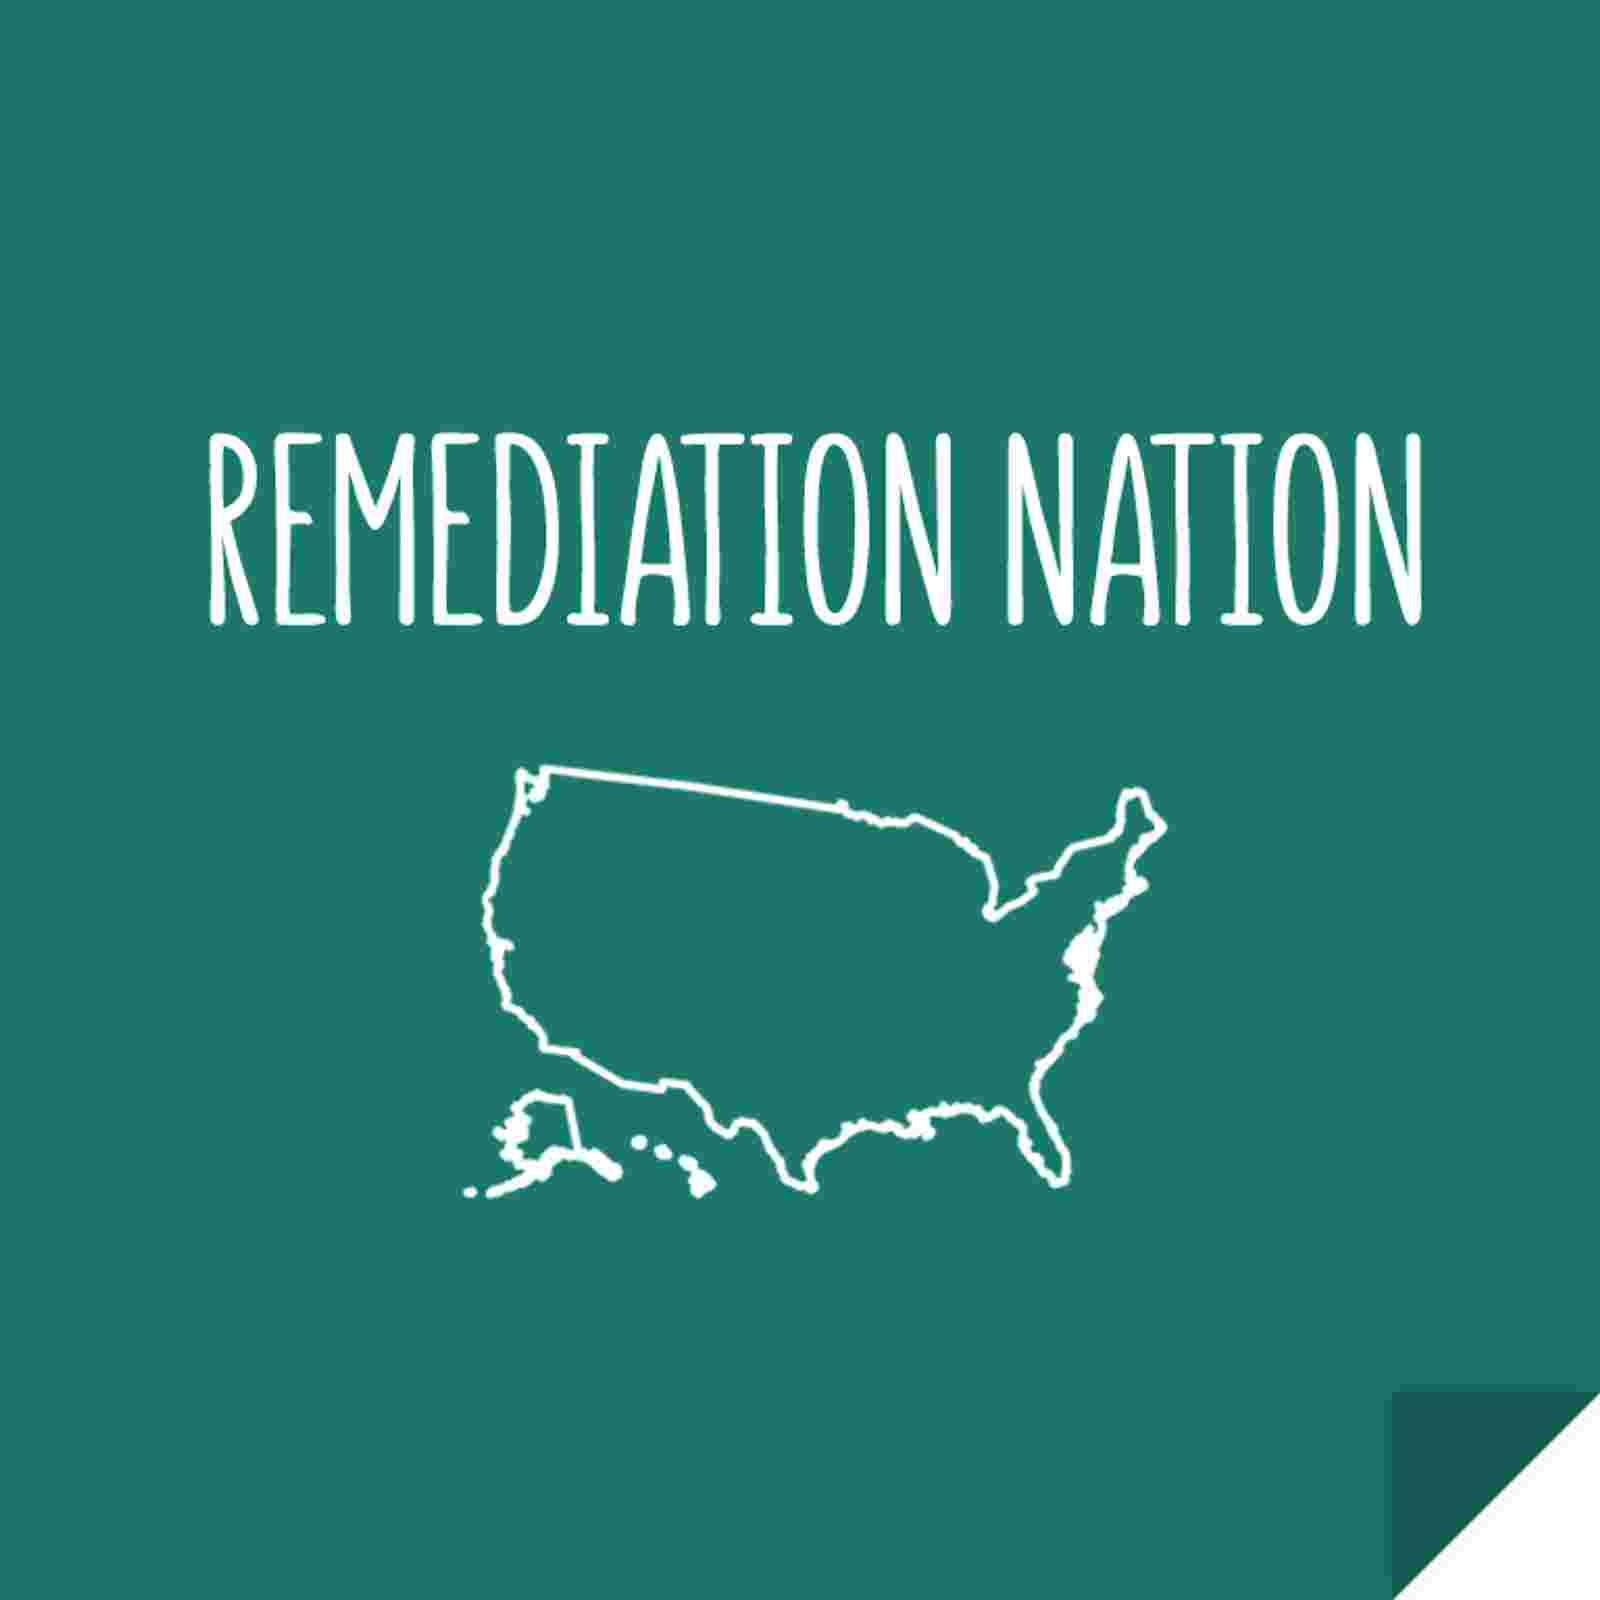 Remediation Nation